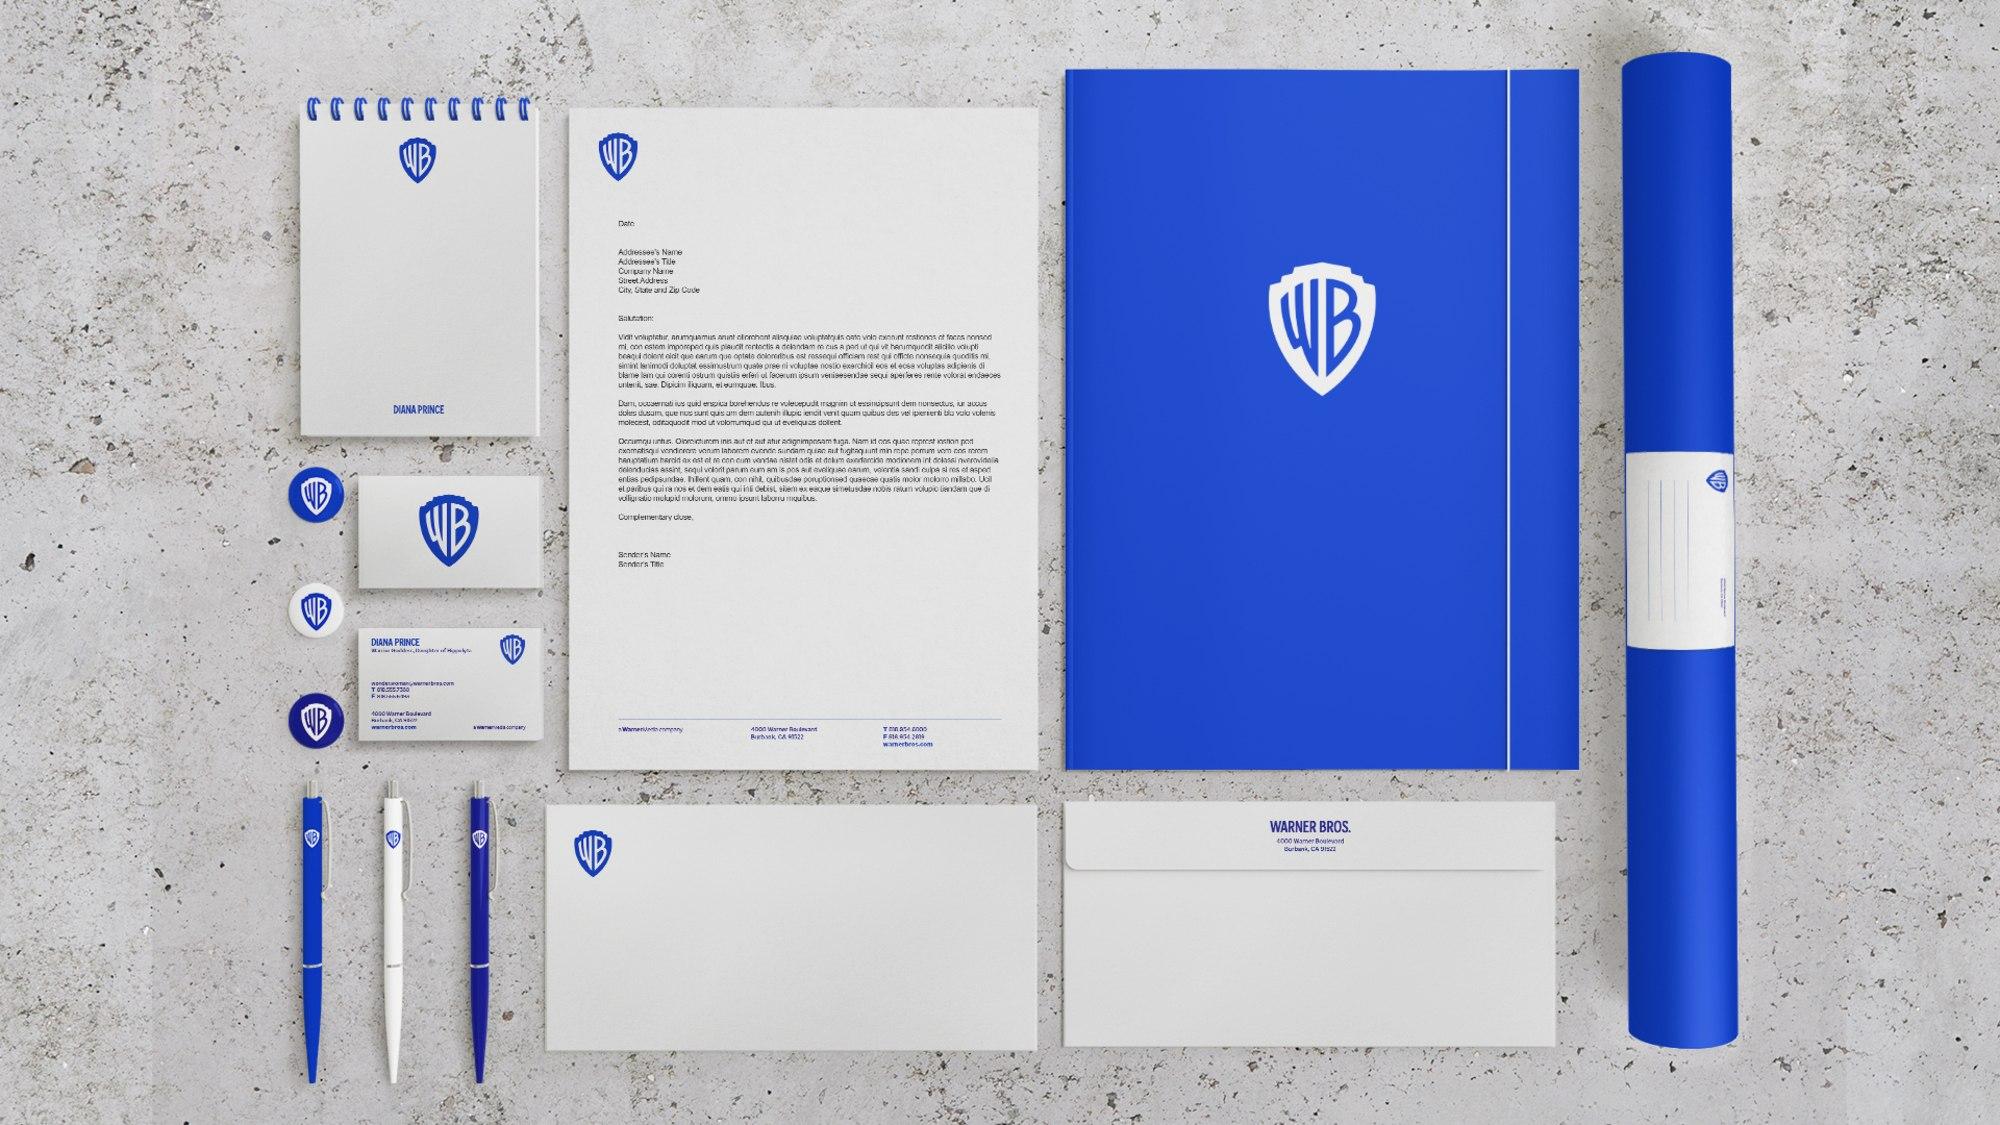 Warner Bros typeface